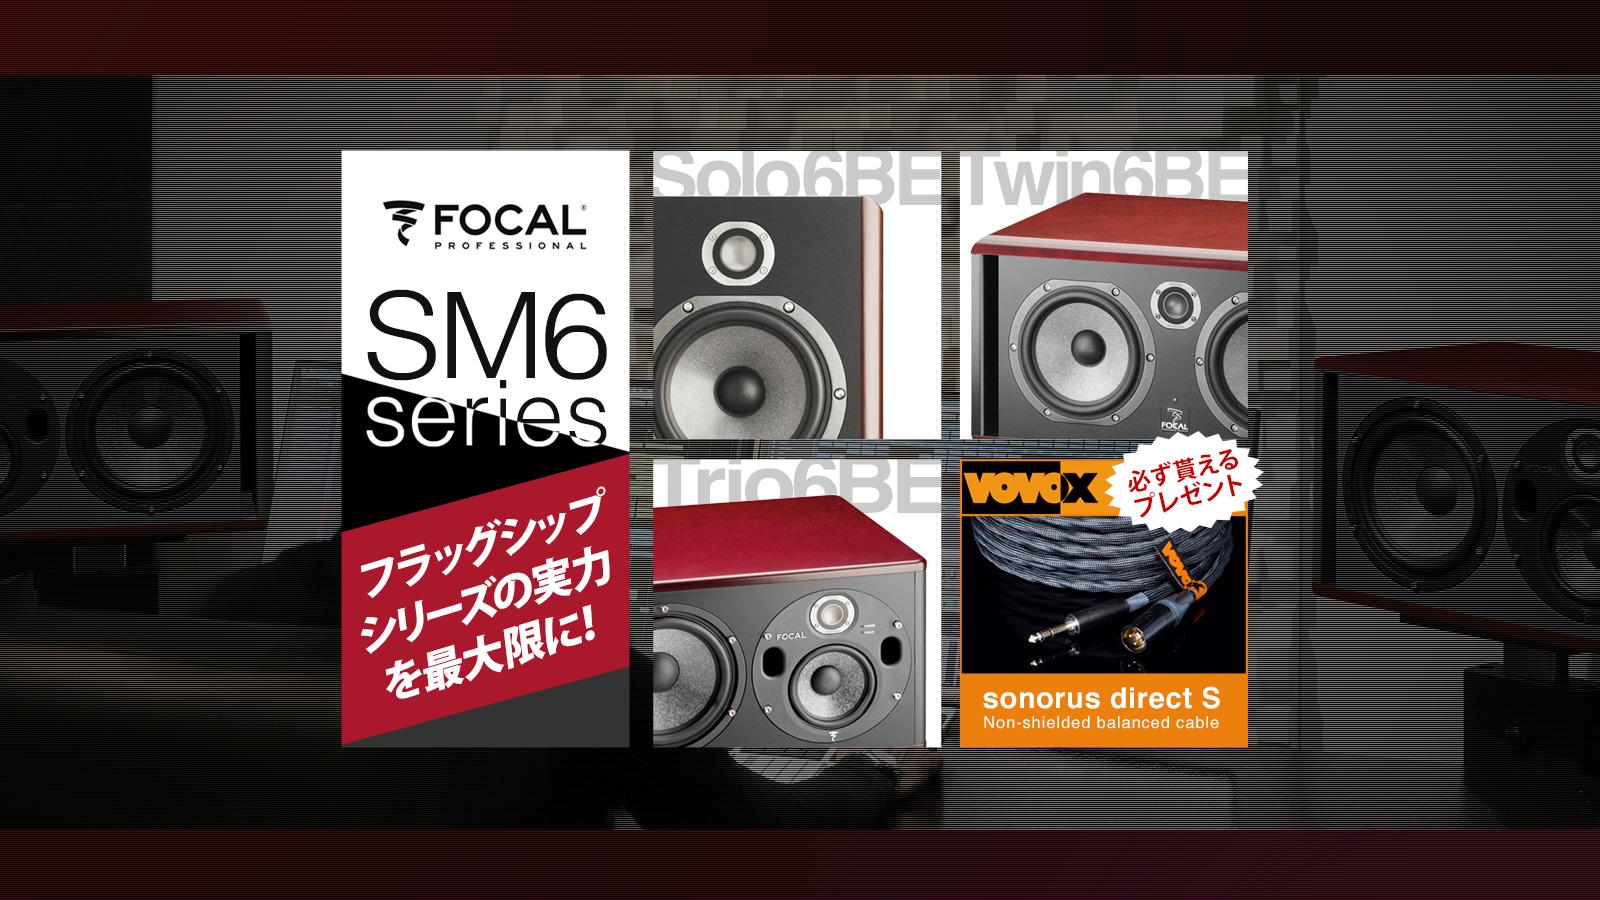 Focalフラッグシップ・シリーズの実力を最大限に!!SM6シリーズ+VOVOXケーブルもれなくプレゼント・キャンペーン